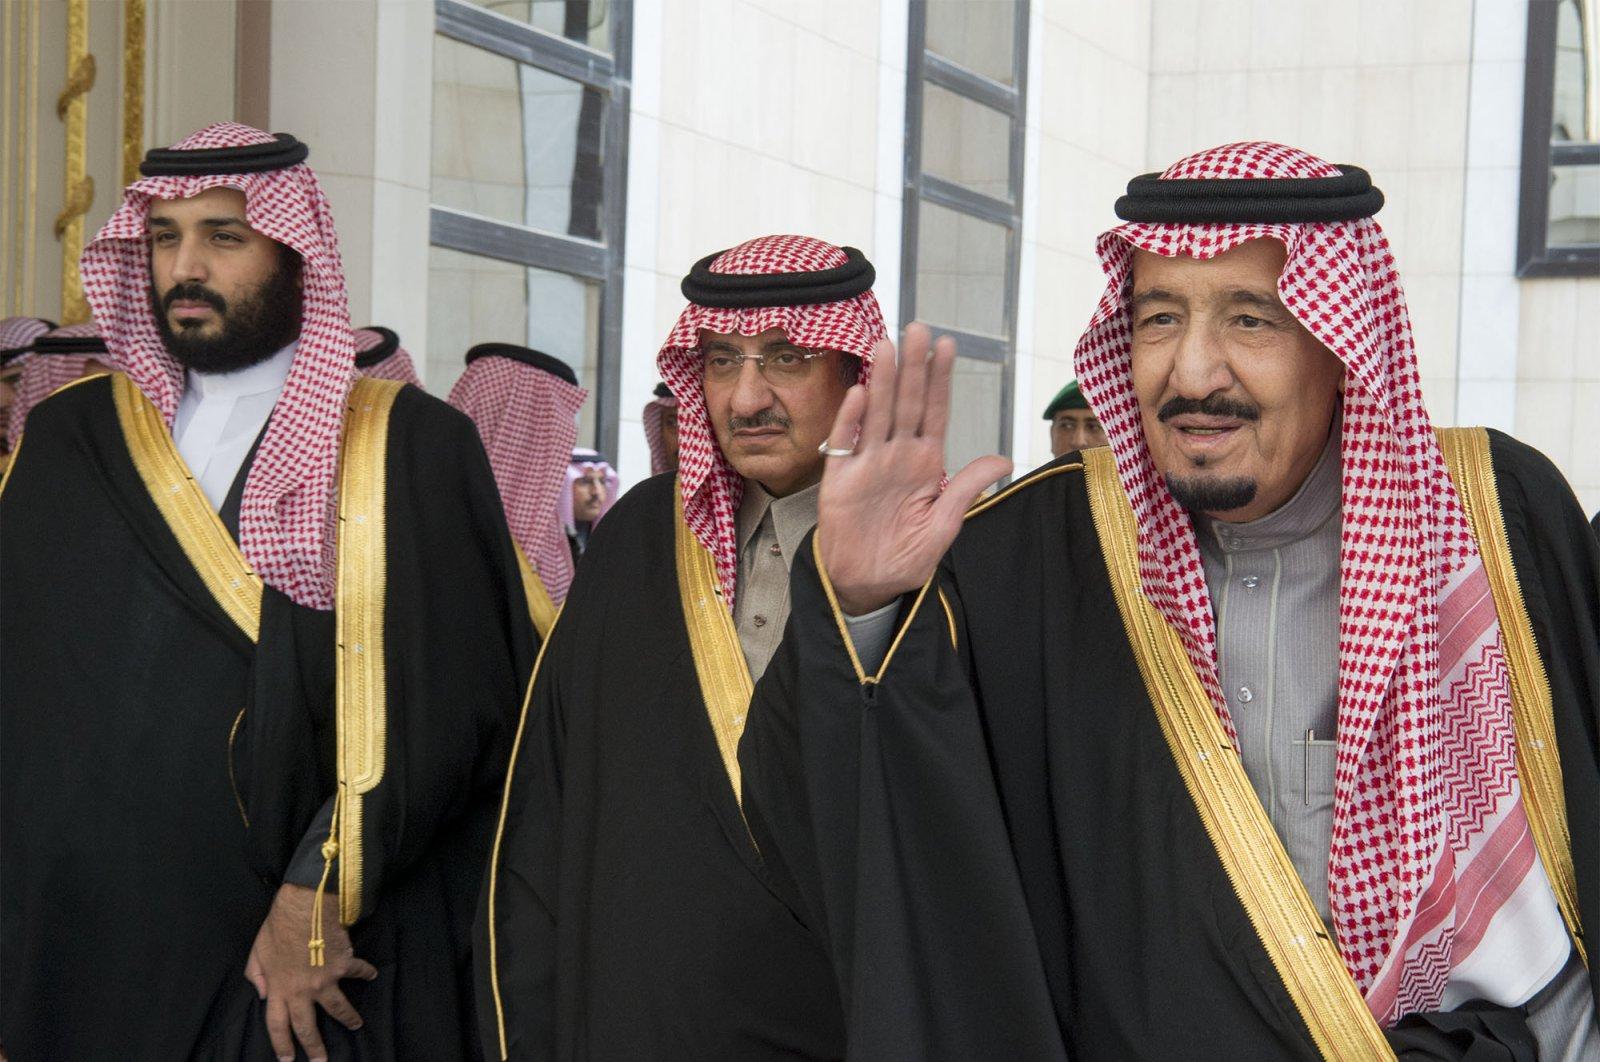 Saudi King Salman bin Abdulaziz (R), Crown Prince Mohammed bin Nayef (C) and deputy Crown Prince Mohammed bin Salman arrive for the opening session of the Shura Council, Riyadh, Dec. 14, 2016. (AFP Photo)